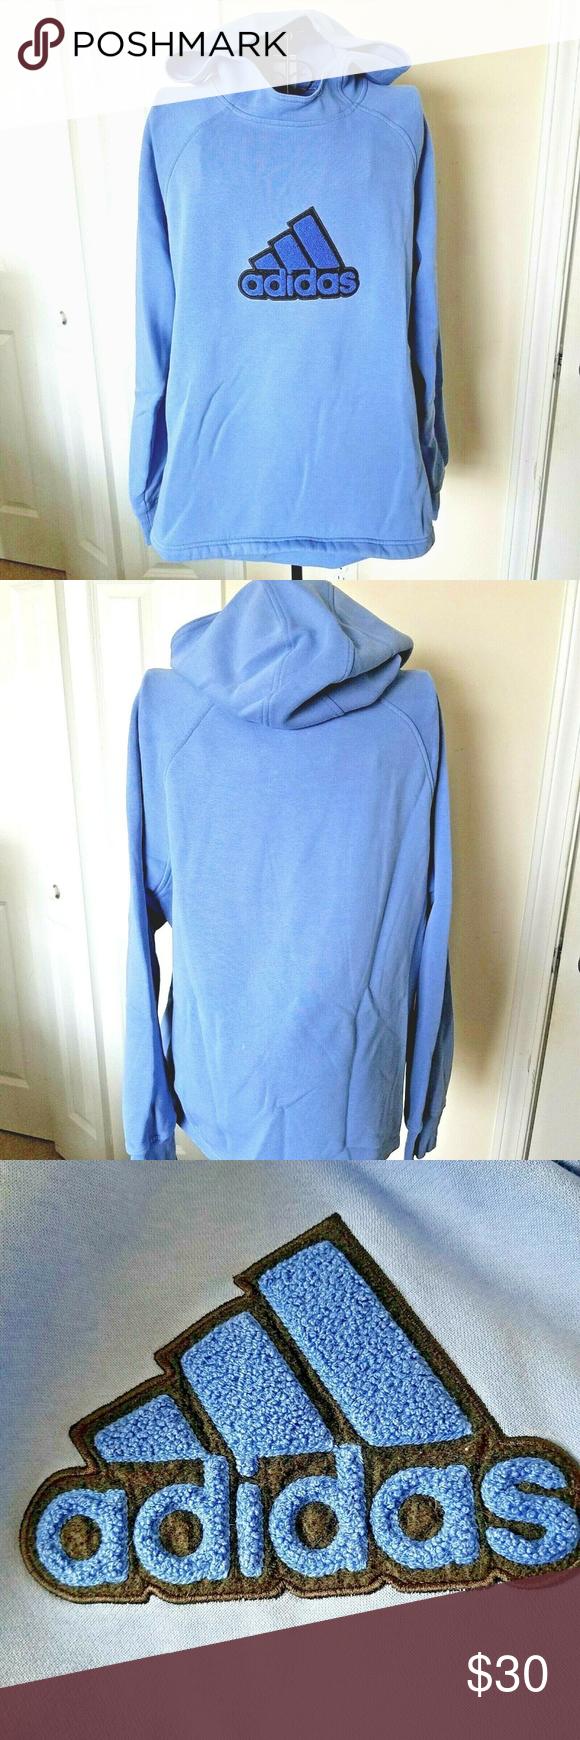 Adidas Hoodie Sweatshirt Xl Light Blue Large Logo Trendy Sweatshirt Adidas Hoodie Sweatshirts Hoodie [ 1740 x 580 Pixel ]